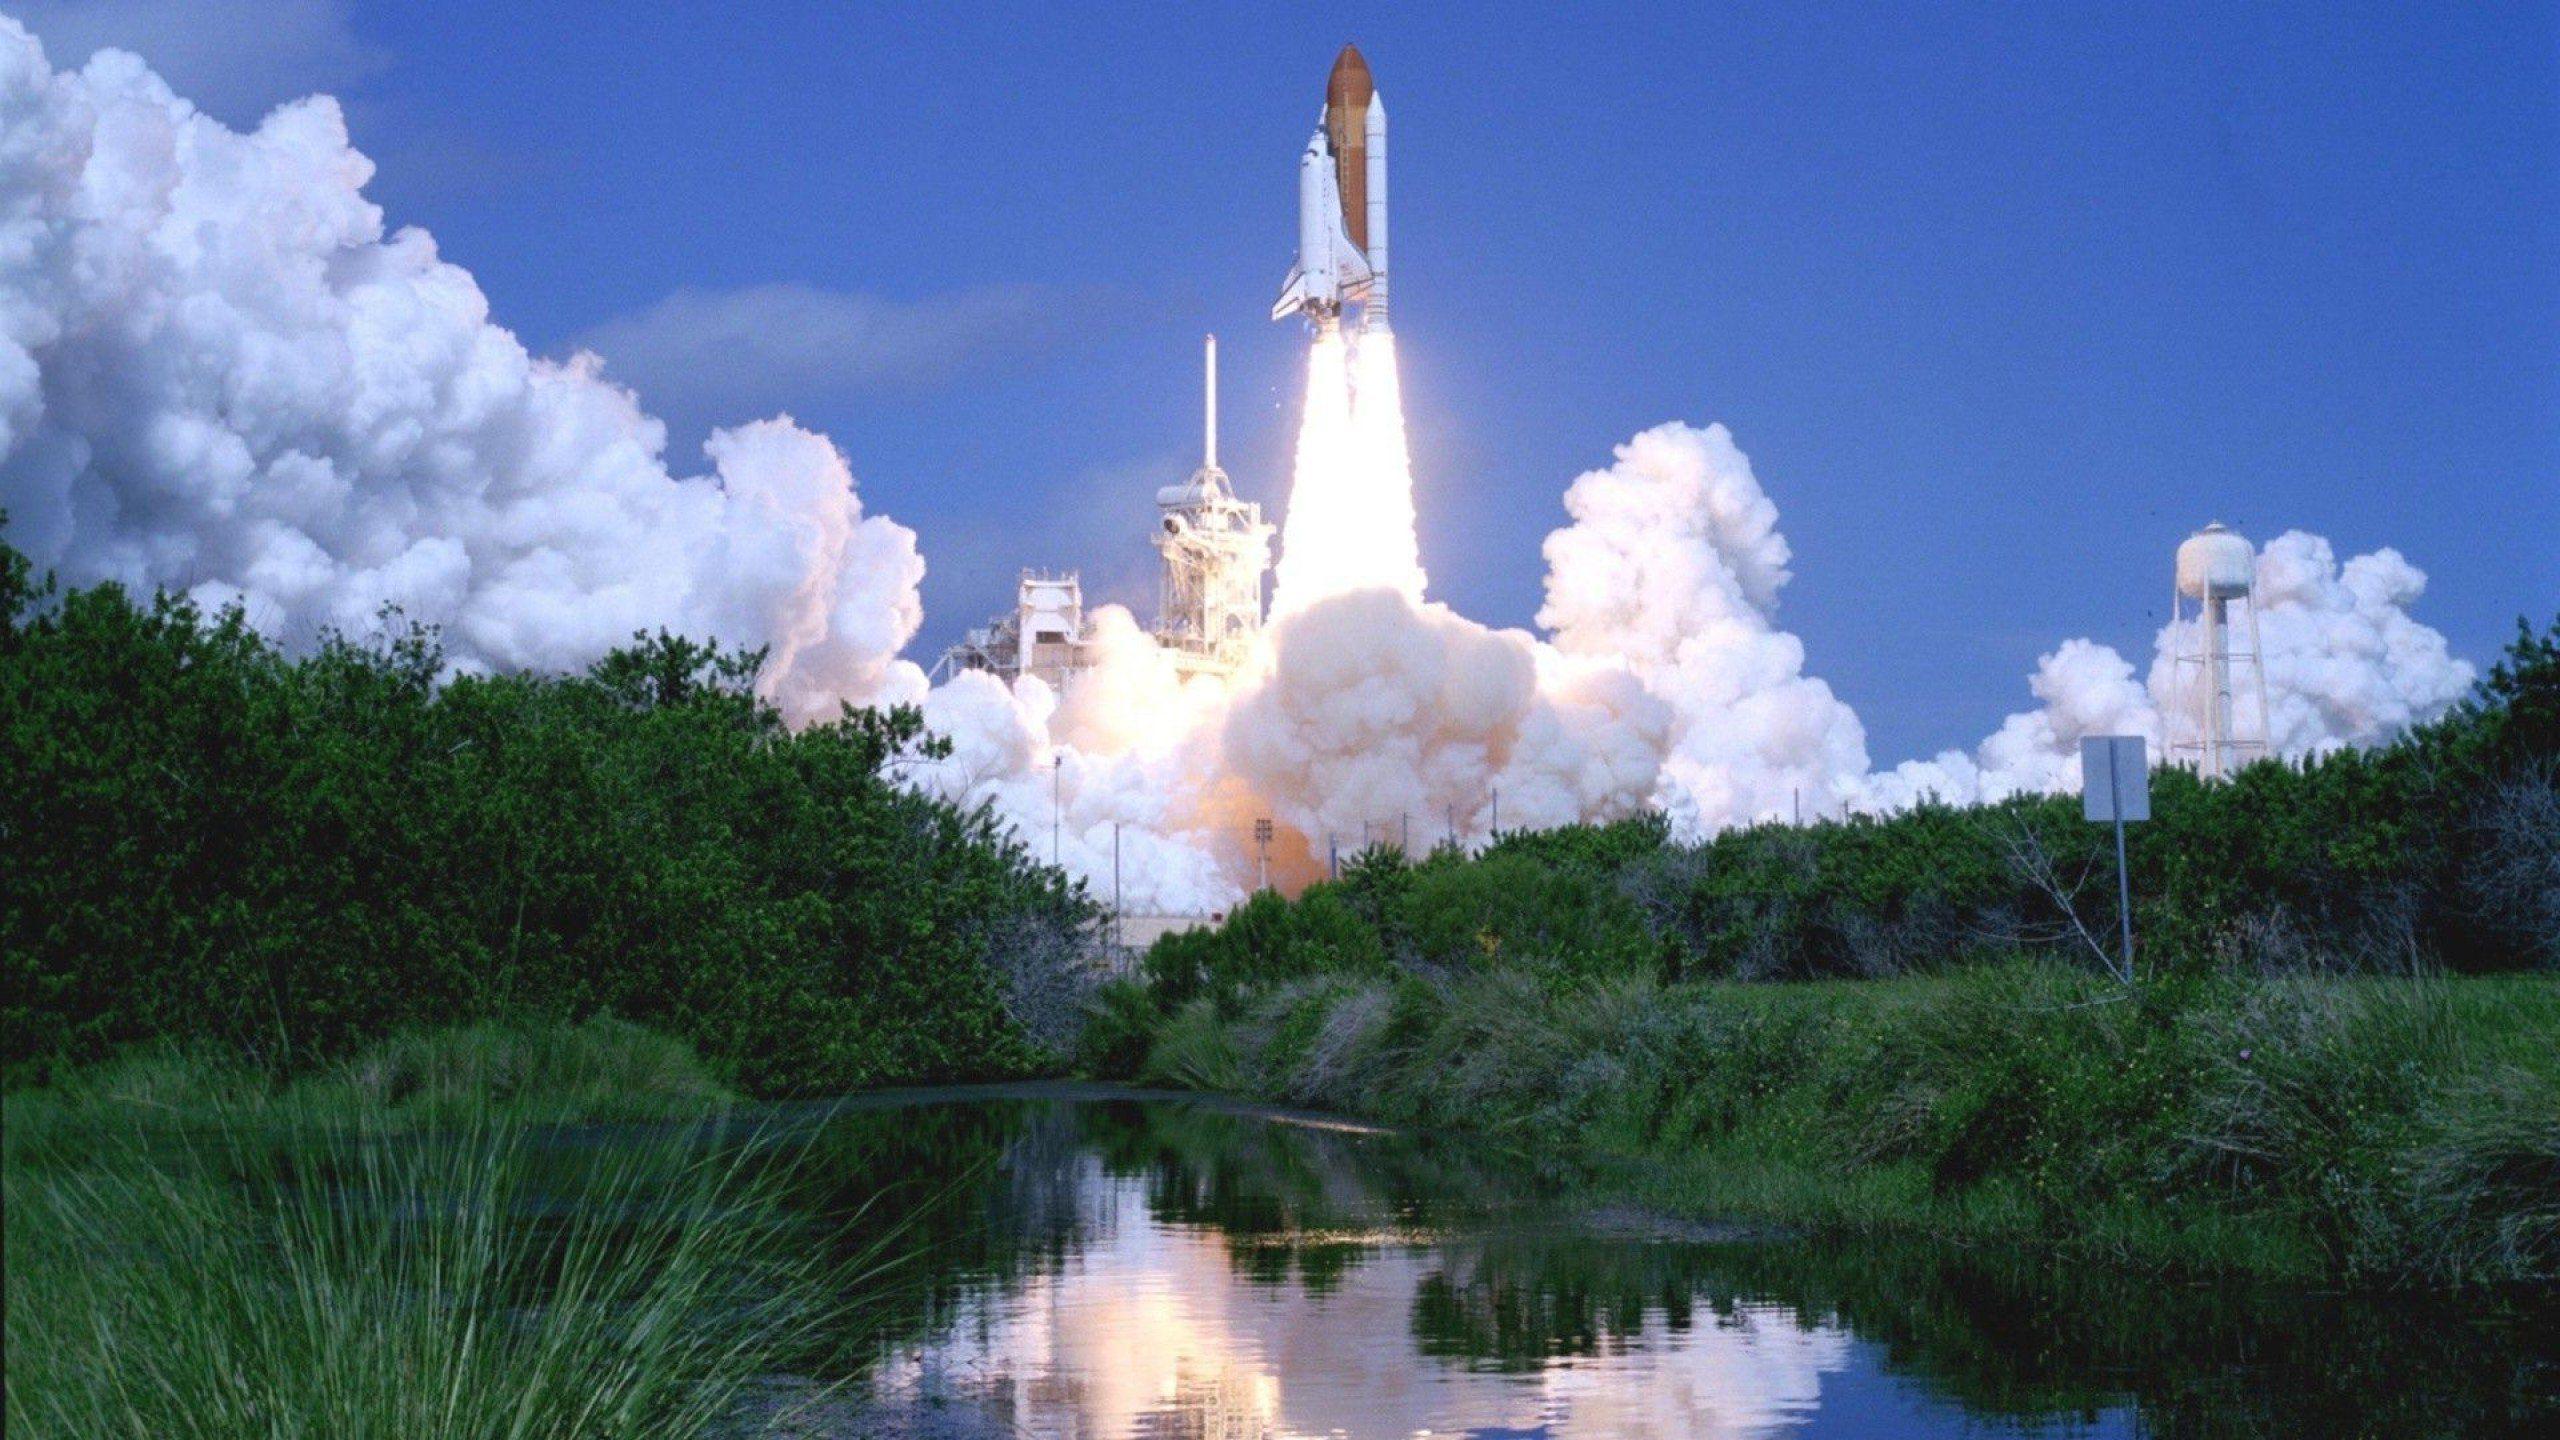 space-shuttle-wallpaper-launch-atlantis-wallpapers